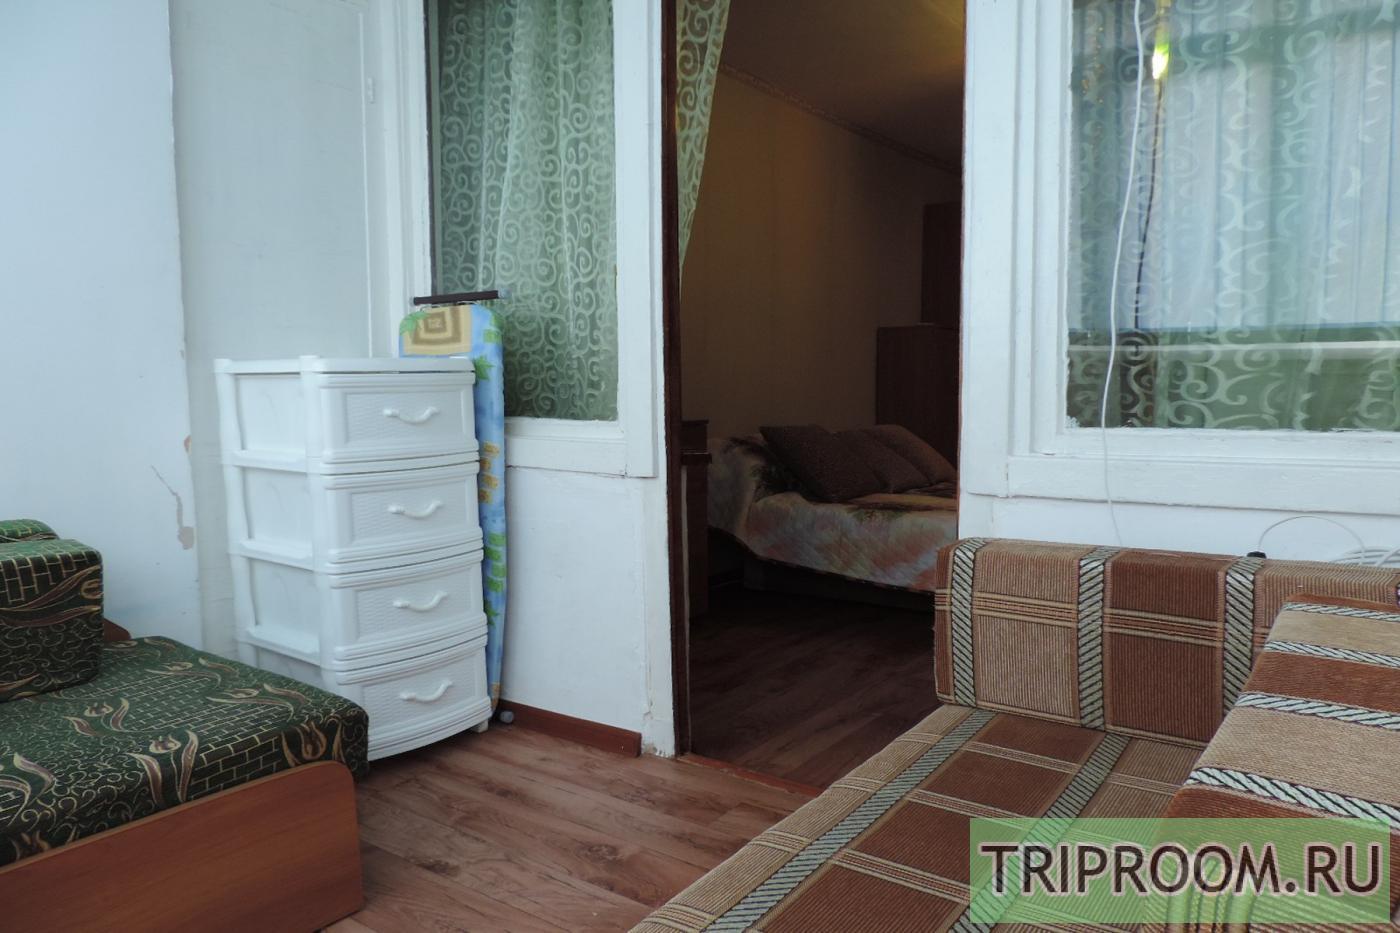 1-комнатная квартира посуточно (вариант № 734), ул. Лазарева улица, фото № 7